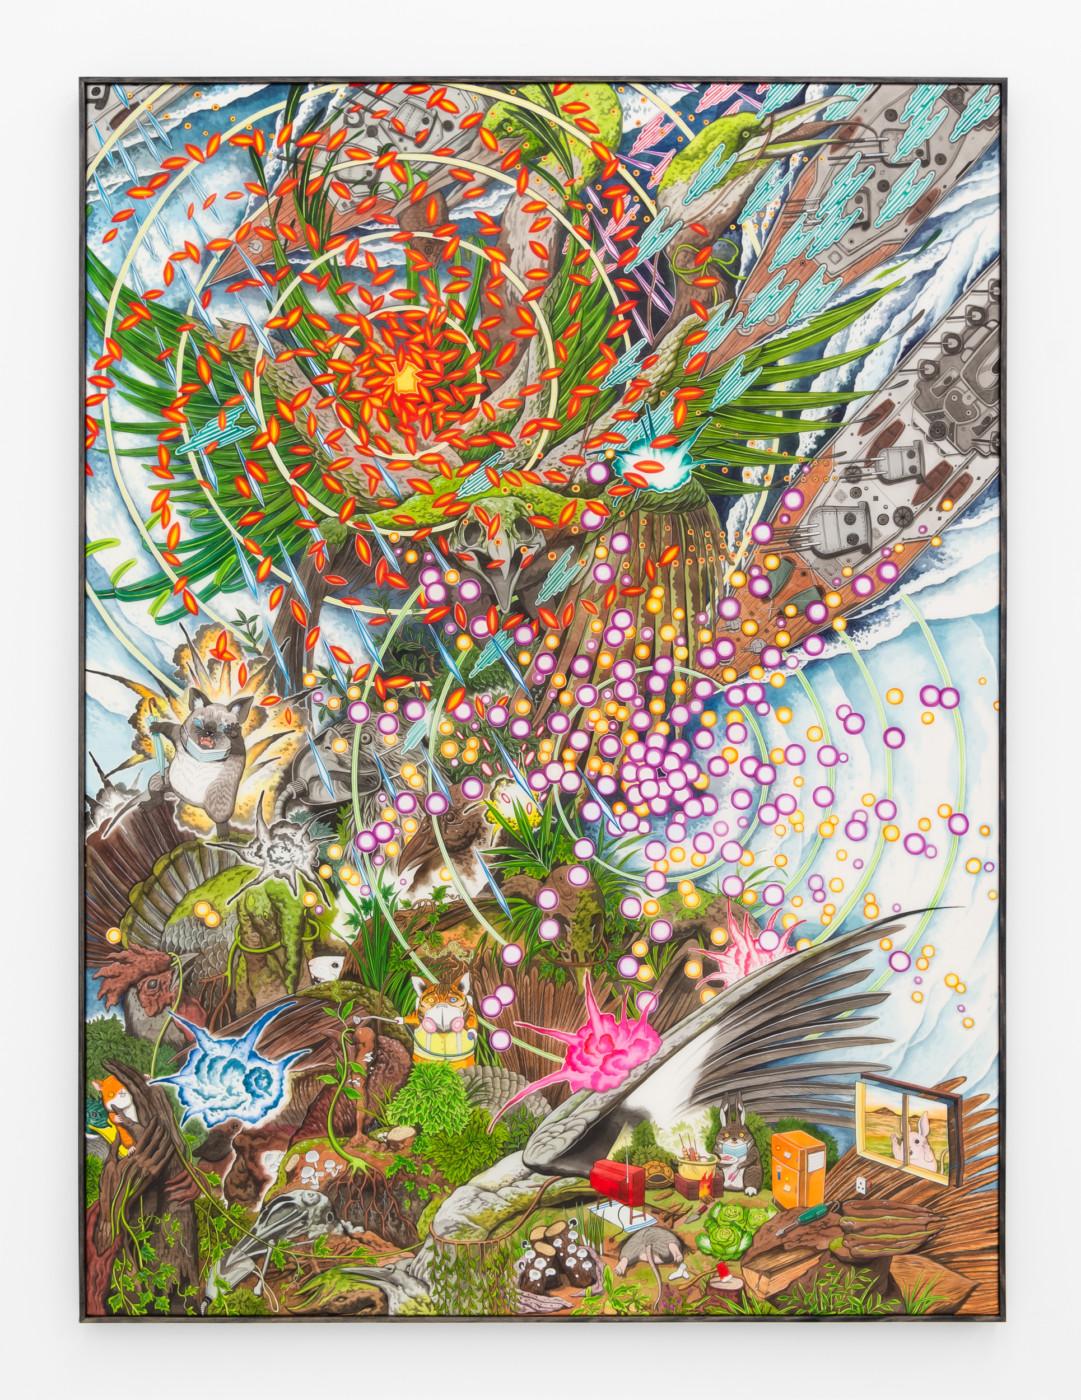 HUN KYU KIM  Last Shelter,  2020 Pigment painted on silk 136 x 102 cm / 53 1/2 x 40 1/8 in - High Art Gallery Paris